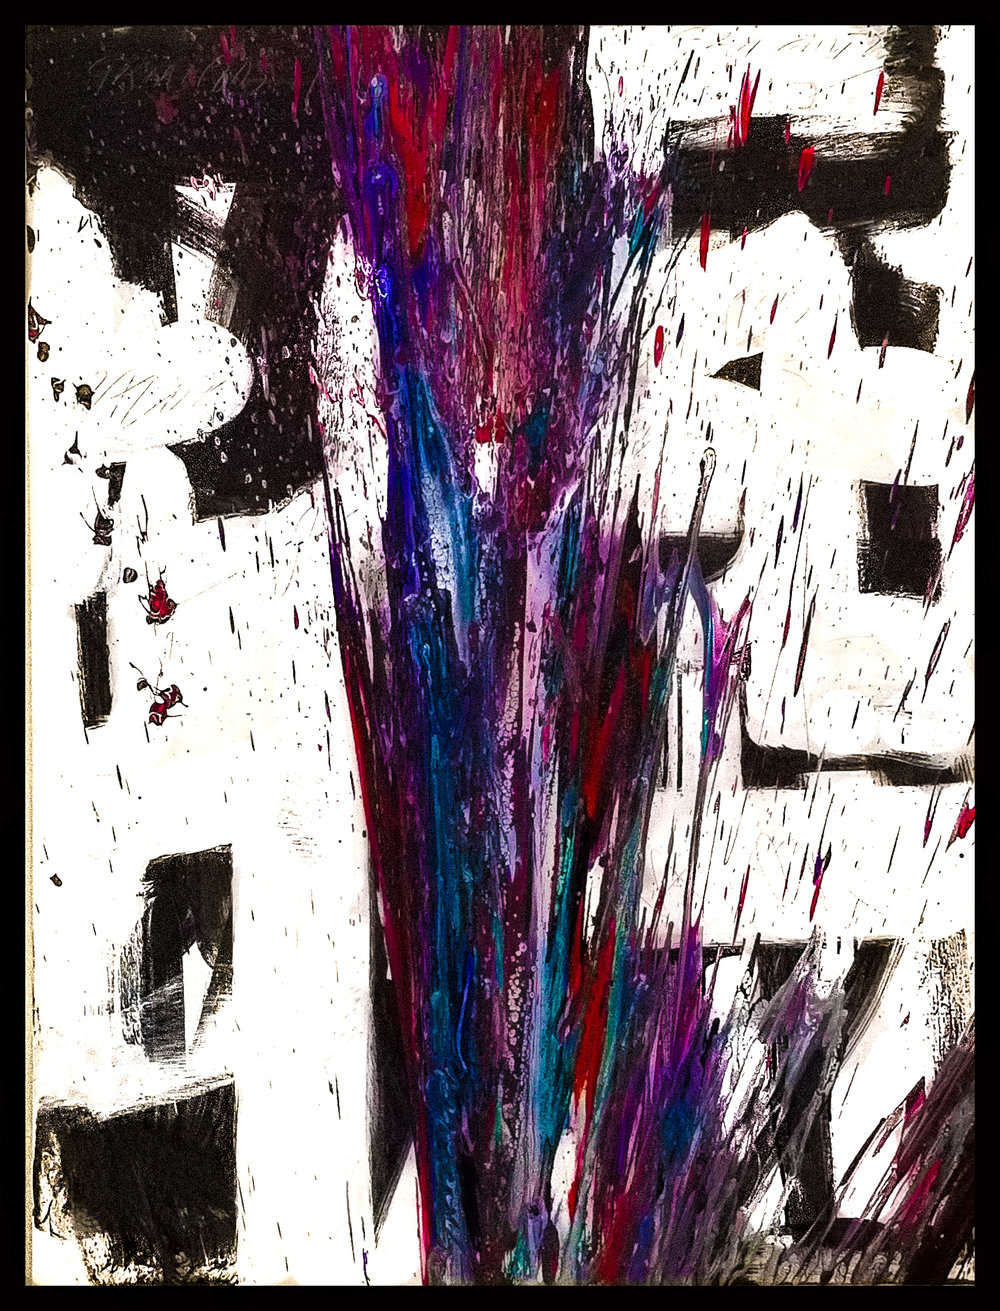 "Splash of Colour 2 #136, 2019, acrylic on canvas, 48"" x 36"" (122 x 91.4 cm)"